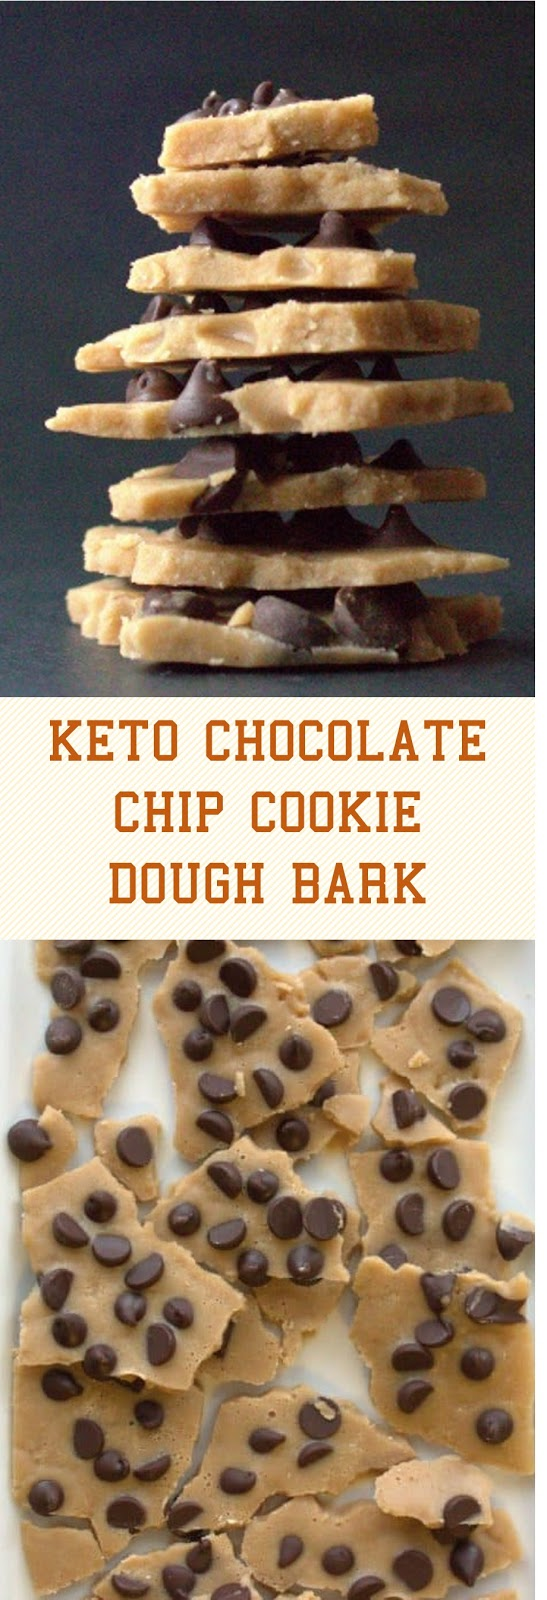 KETO CHOCOLATE CHIP COOKIE DOUGH BARK